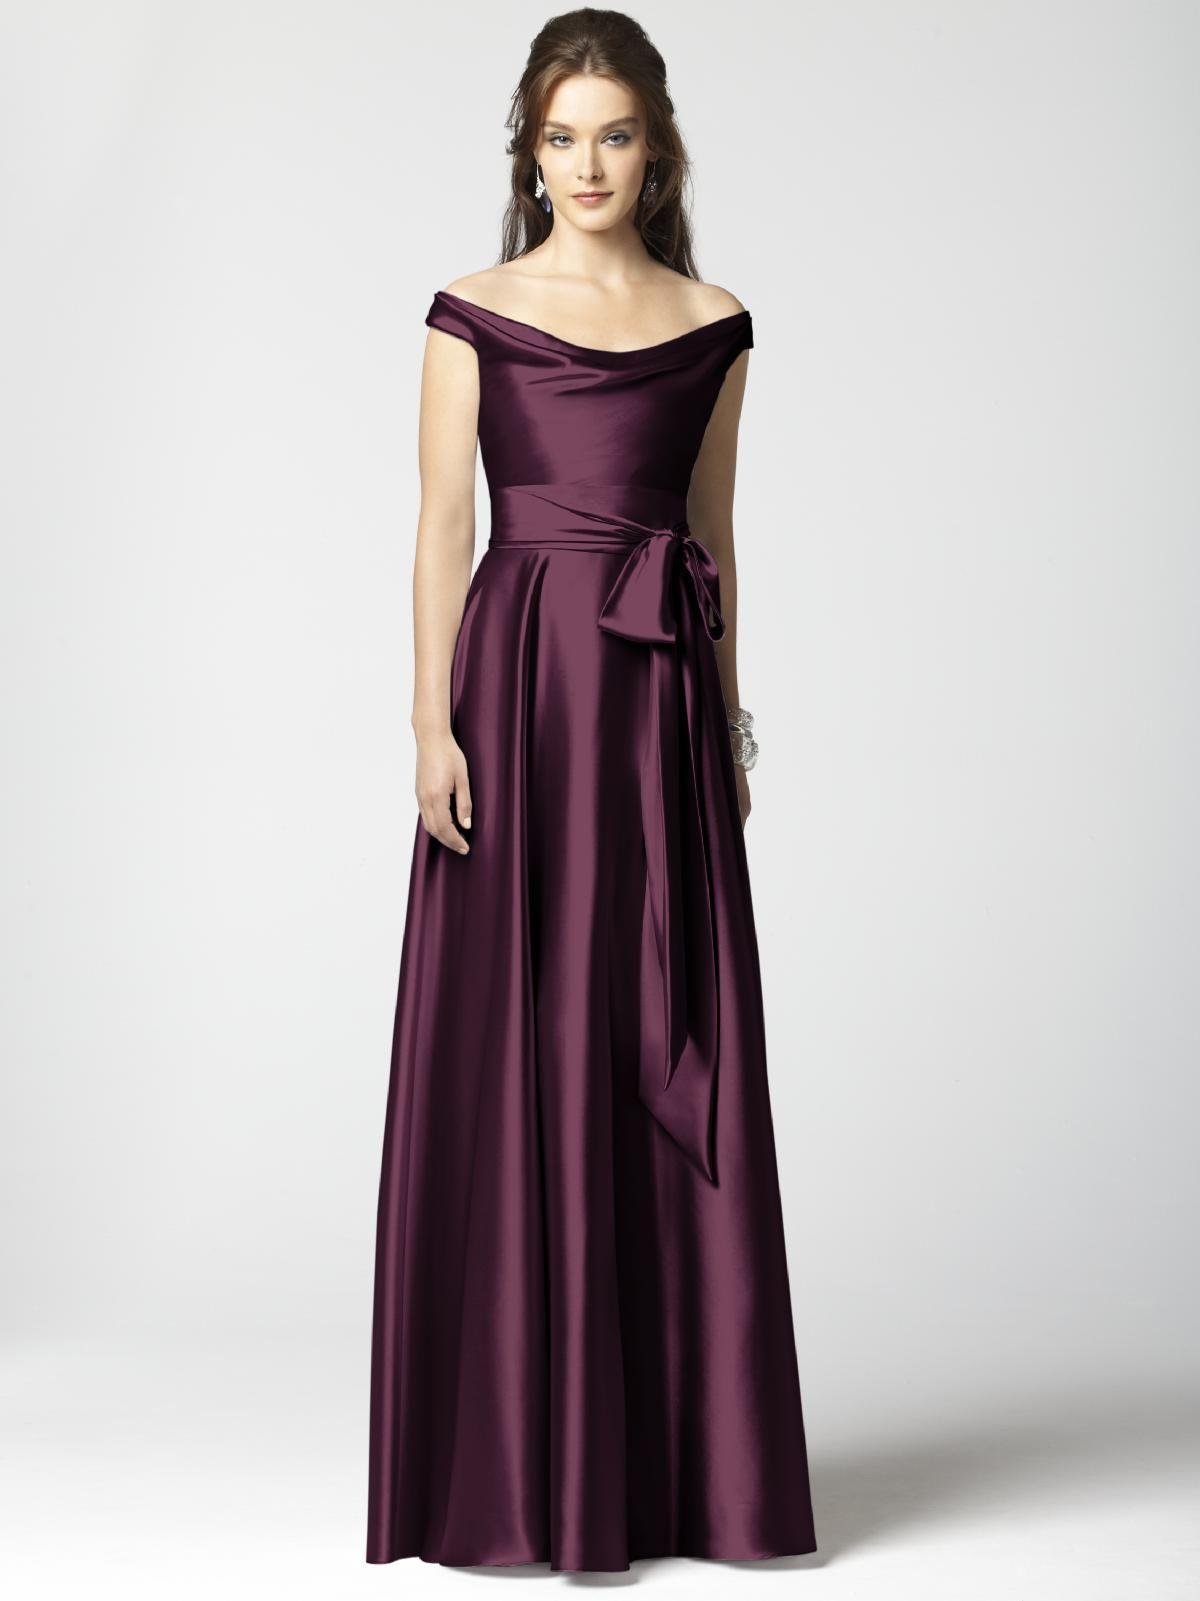 Dessy Collection Style 2864 #purple #bridesmaid #dress | PURPLE ...